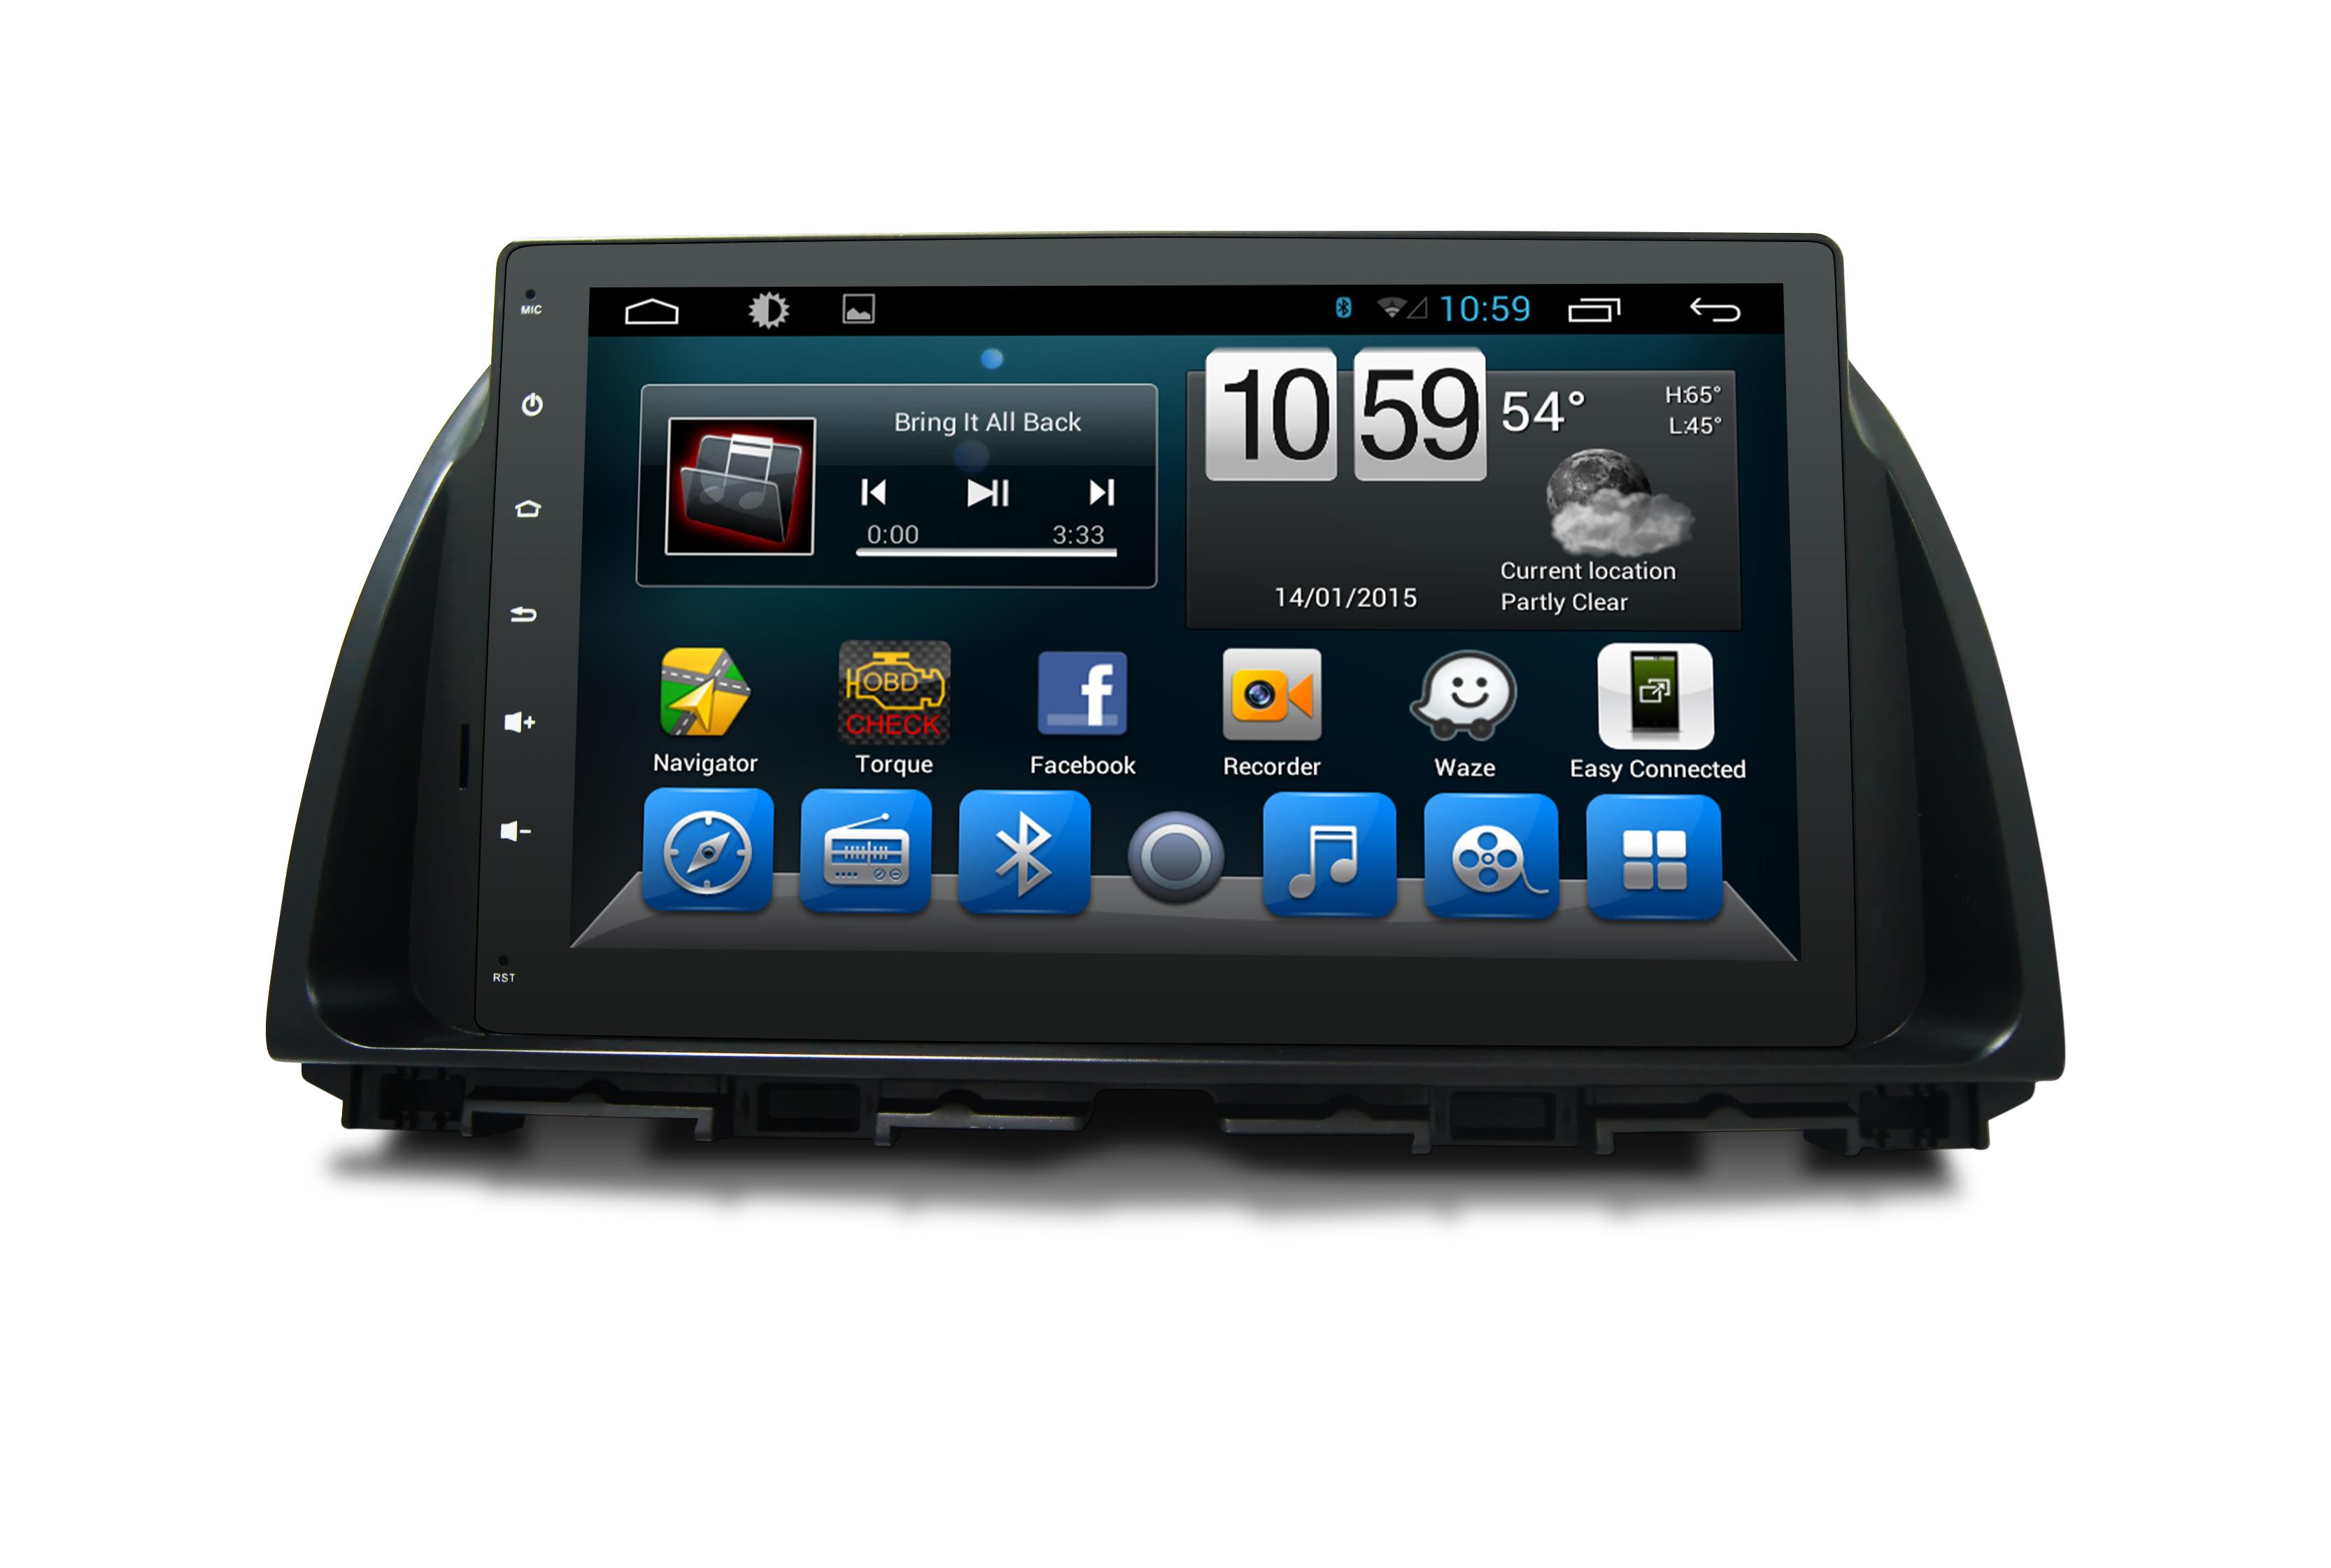 Штатная магнитола CARMEDIA QR-1045-T8 Mazda CX-5 2011-2016 с поддержкой всех штатных функций (1 поколение KE дорестайл) на OC Android 7.1.2 / 8.1 k1 android 5 1 os smart watch phone mtk6580 512mb 8gb support wifi sim card bluetooth gps smartwatch for ios android os